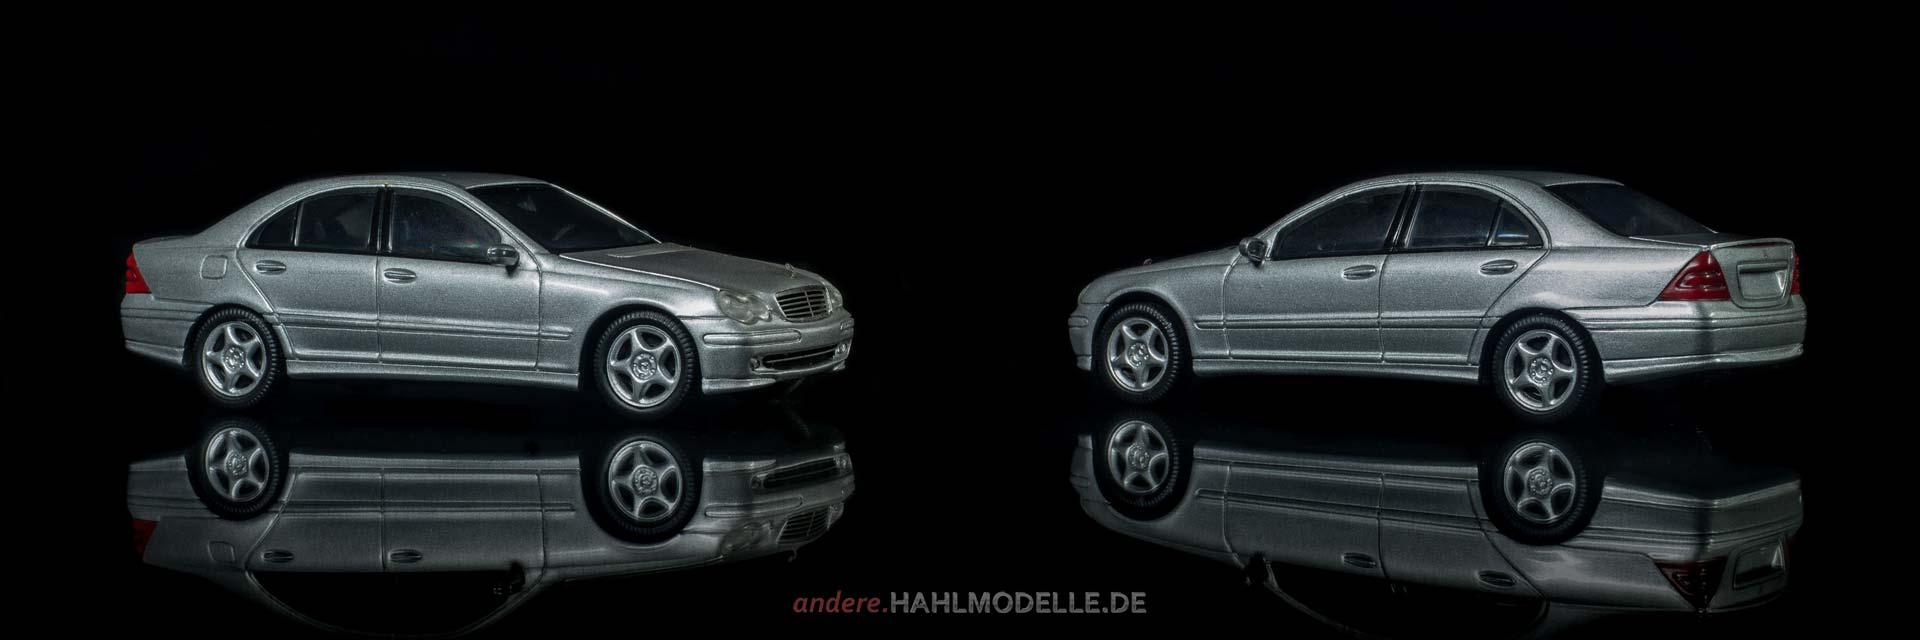 Mercedes-Benz C 220 (W 203 | Limousine | Schuco | www.andere.hahlmodelle.de